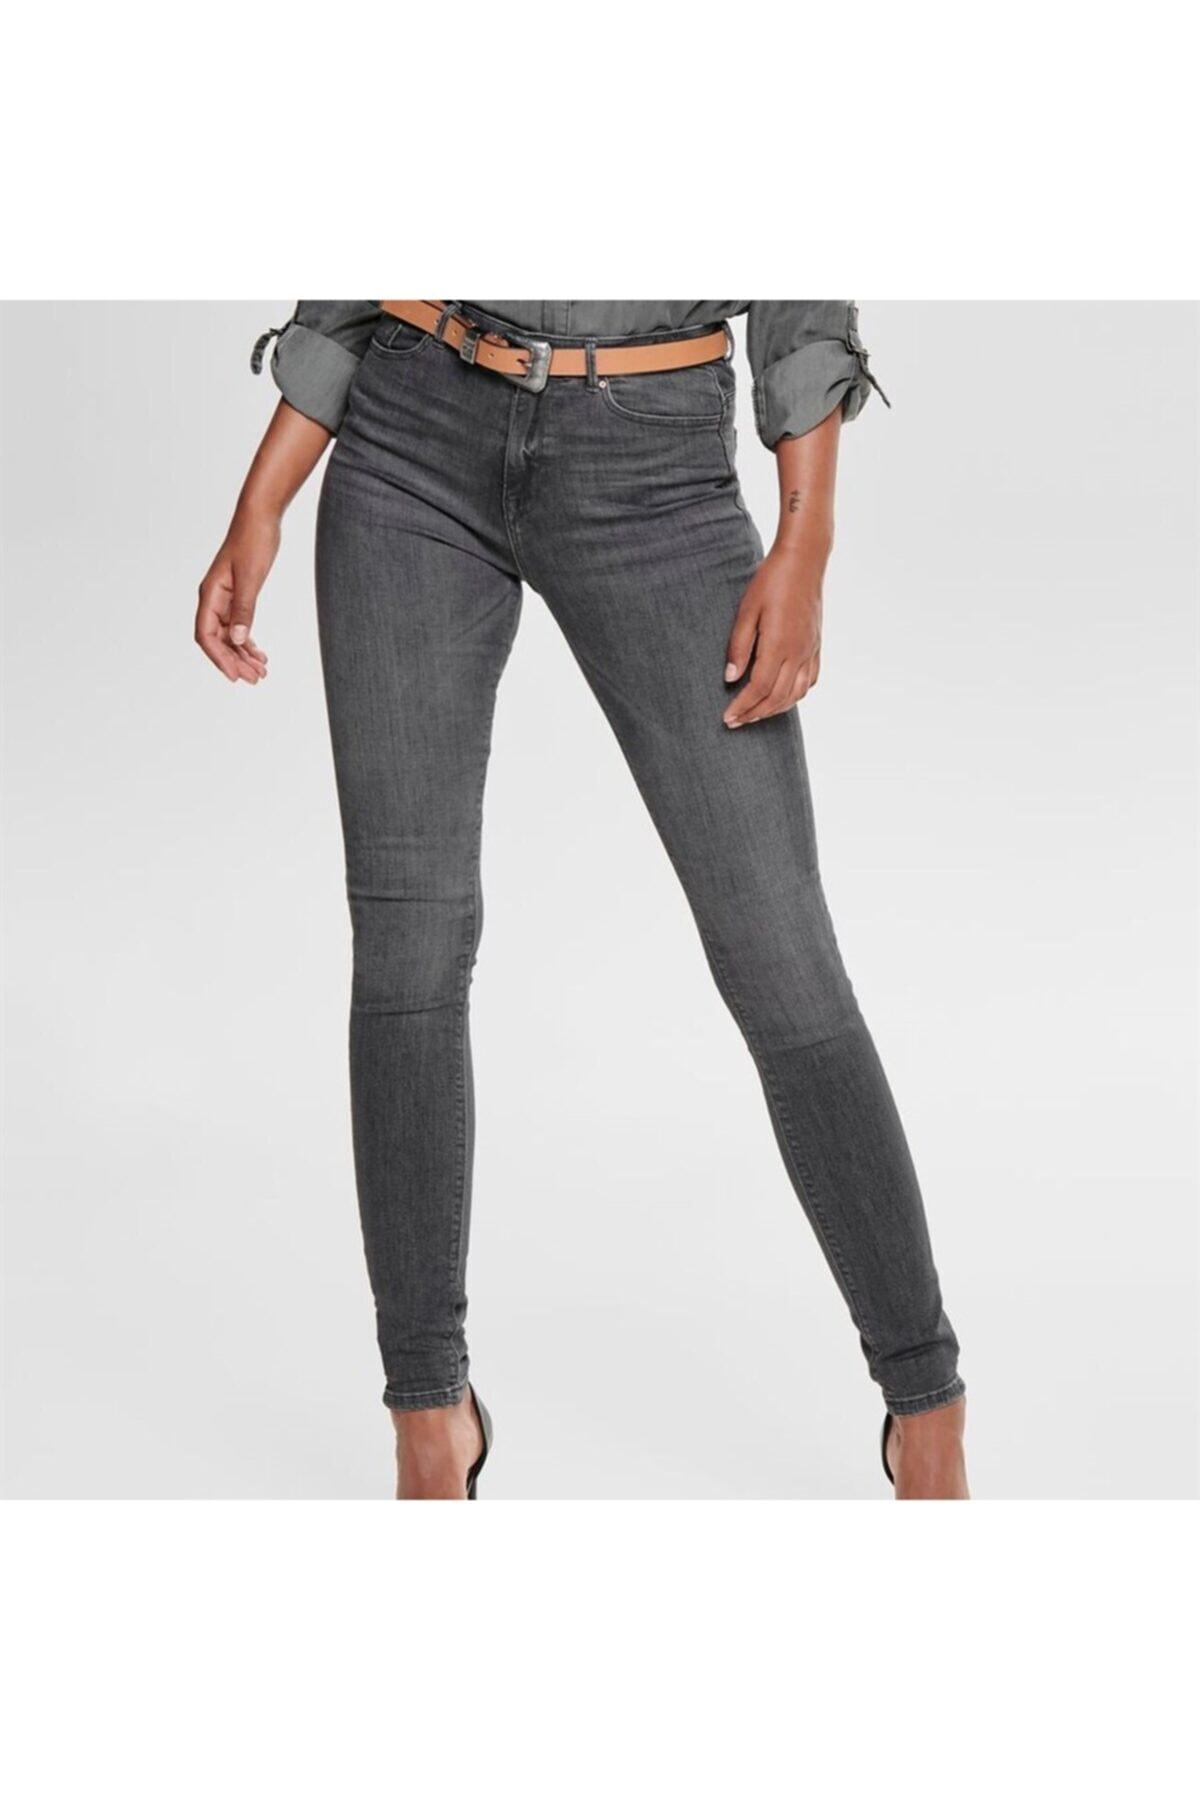 Only Kadın Gri Onlpaola Highwaist Sk Jeans - Bb Azz870 Noos 1